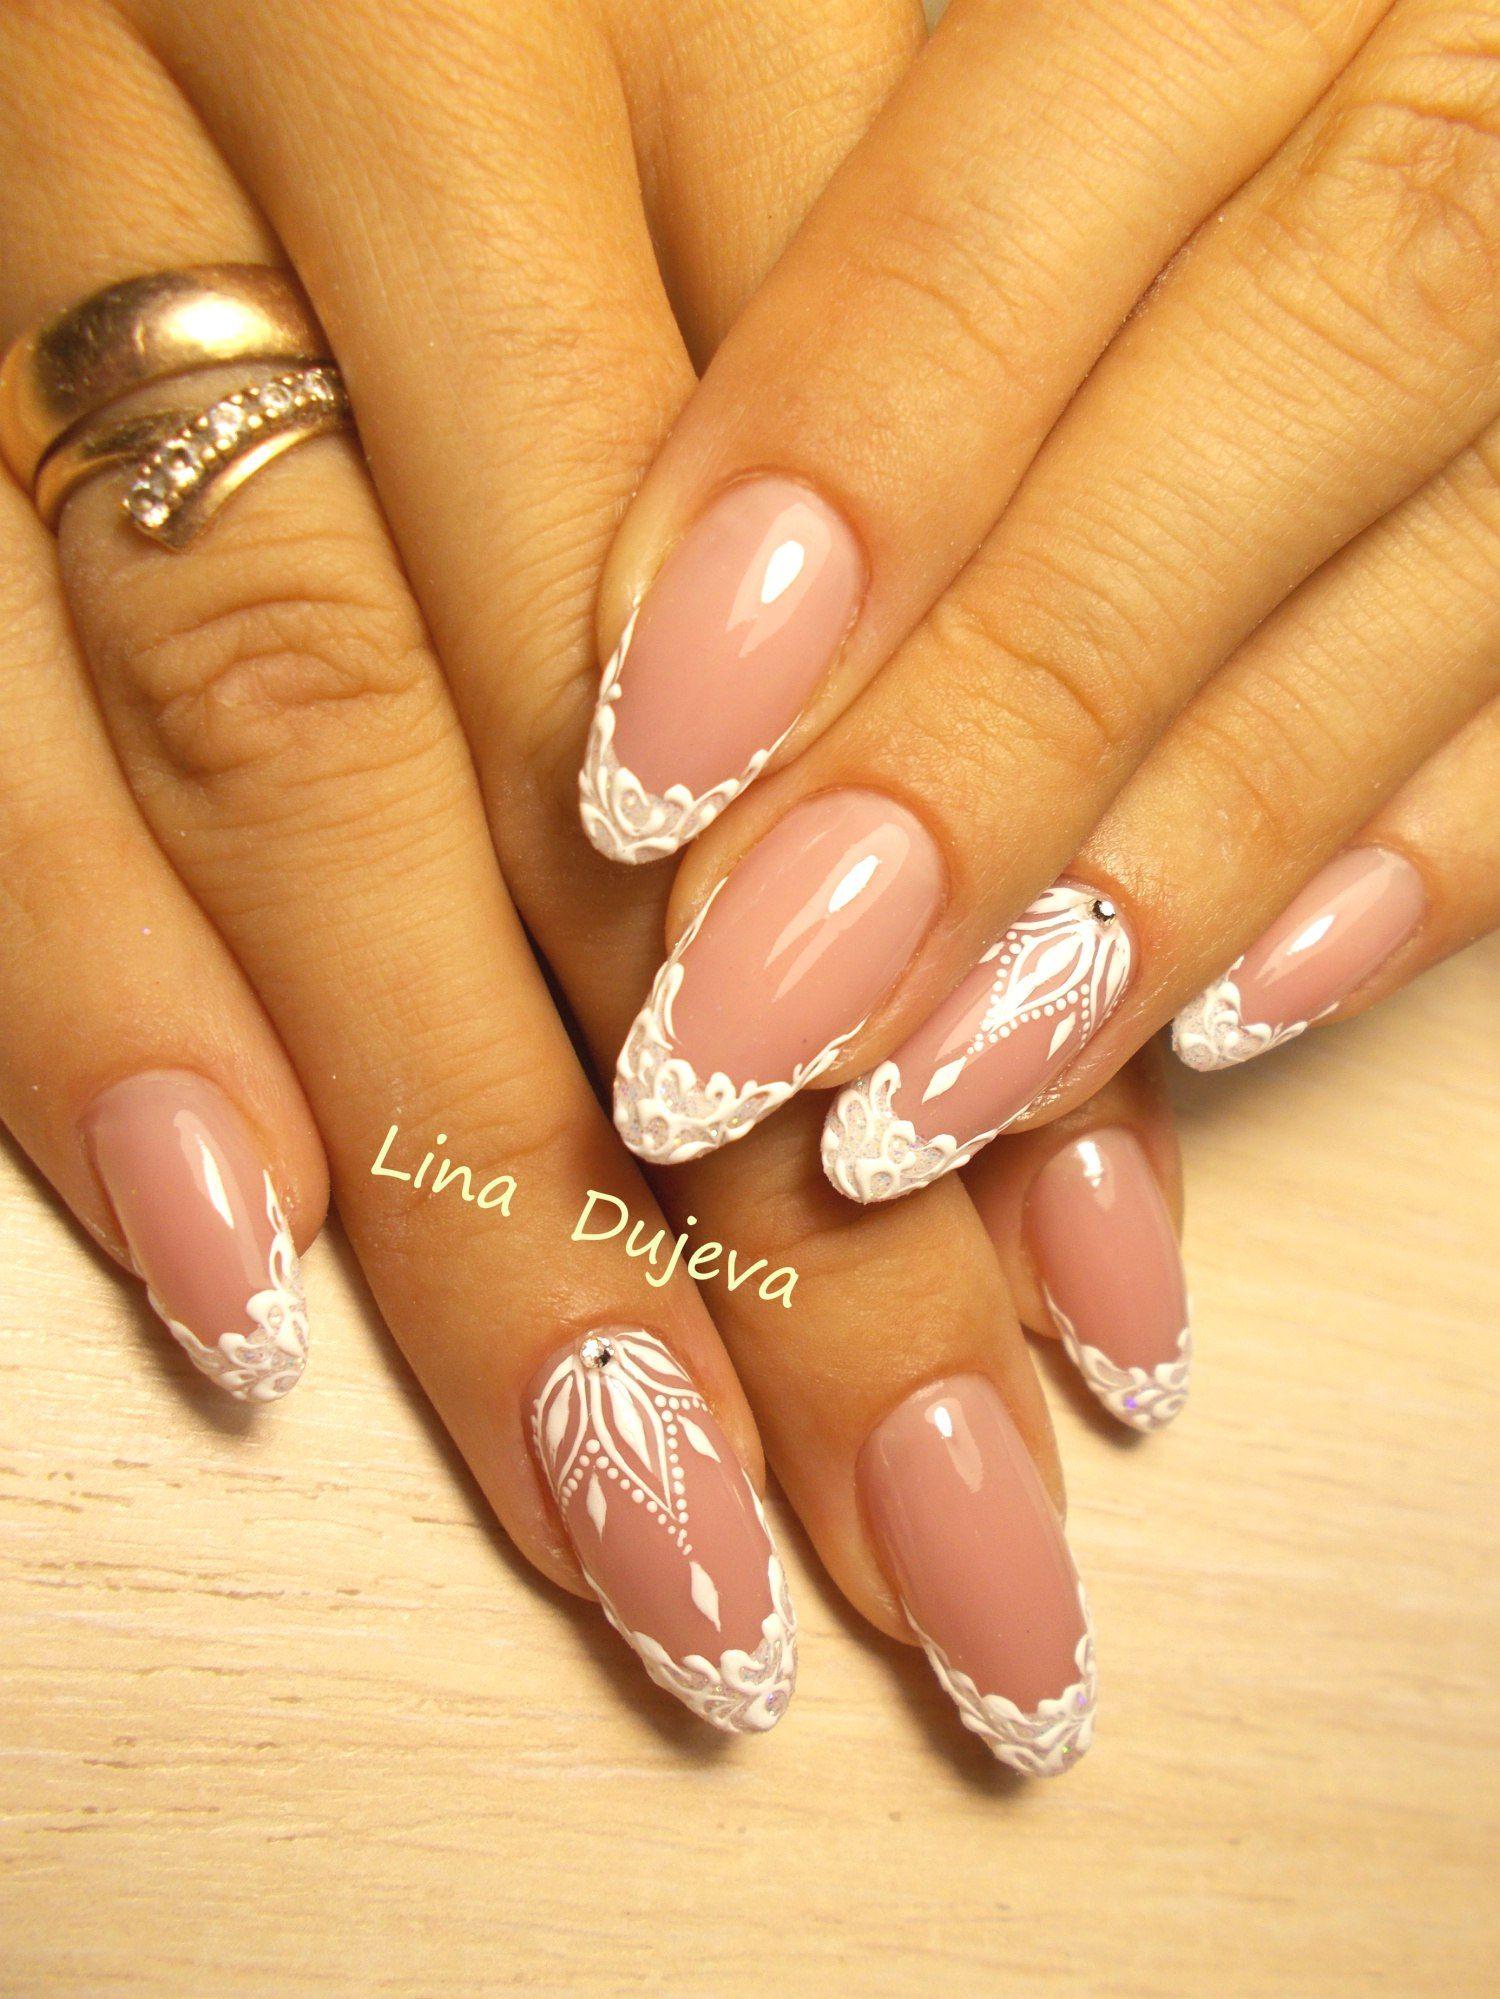 Фотографии Лины Дюжевой in 2020 | Lace nails, Luxury nails ...